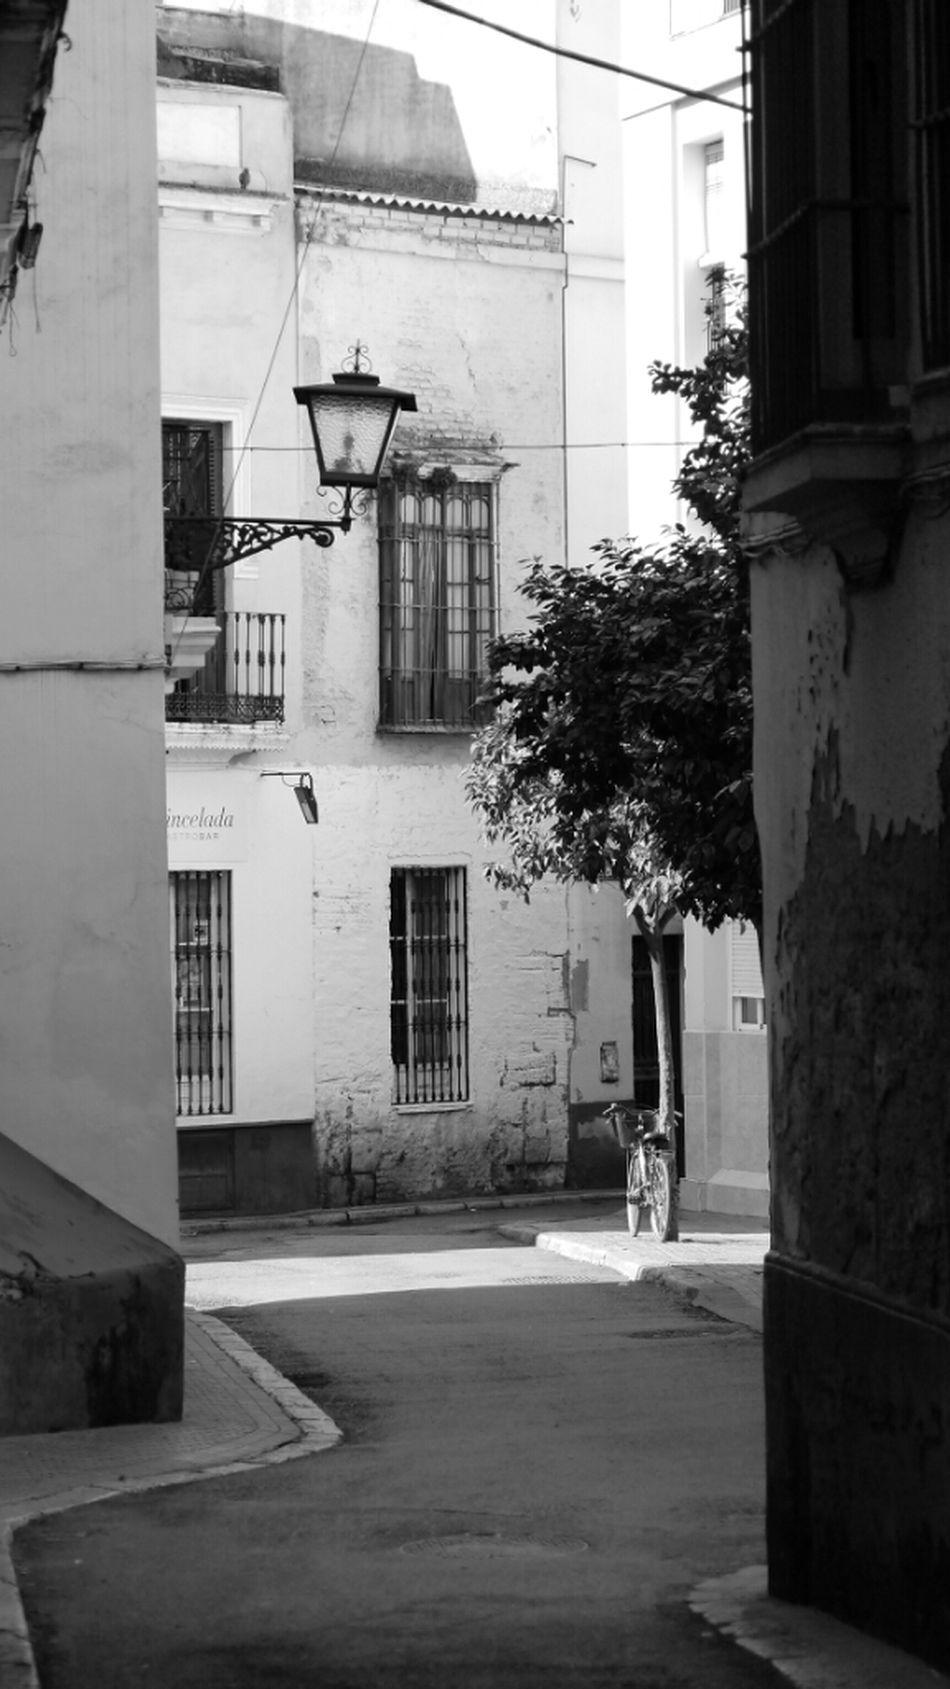 Blackandwhite Bike Alley Monochrome Streetphoto_bw Bws_worldwide Italianbrother Bwstyles_gf